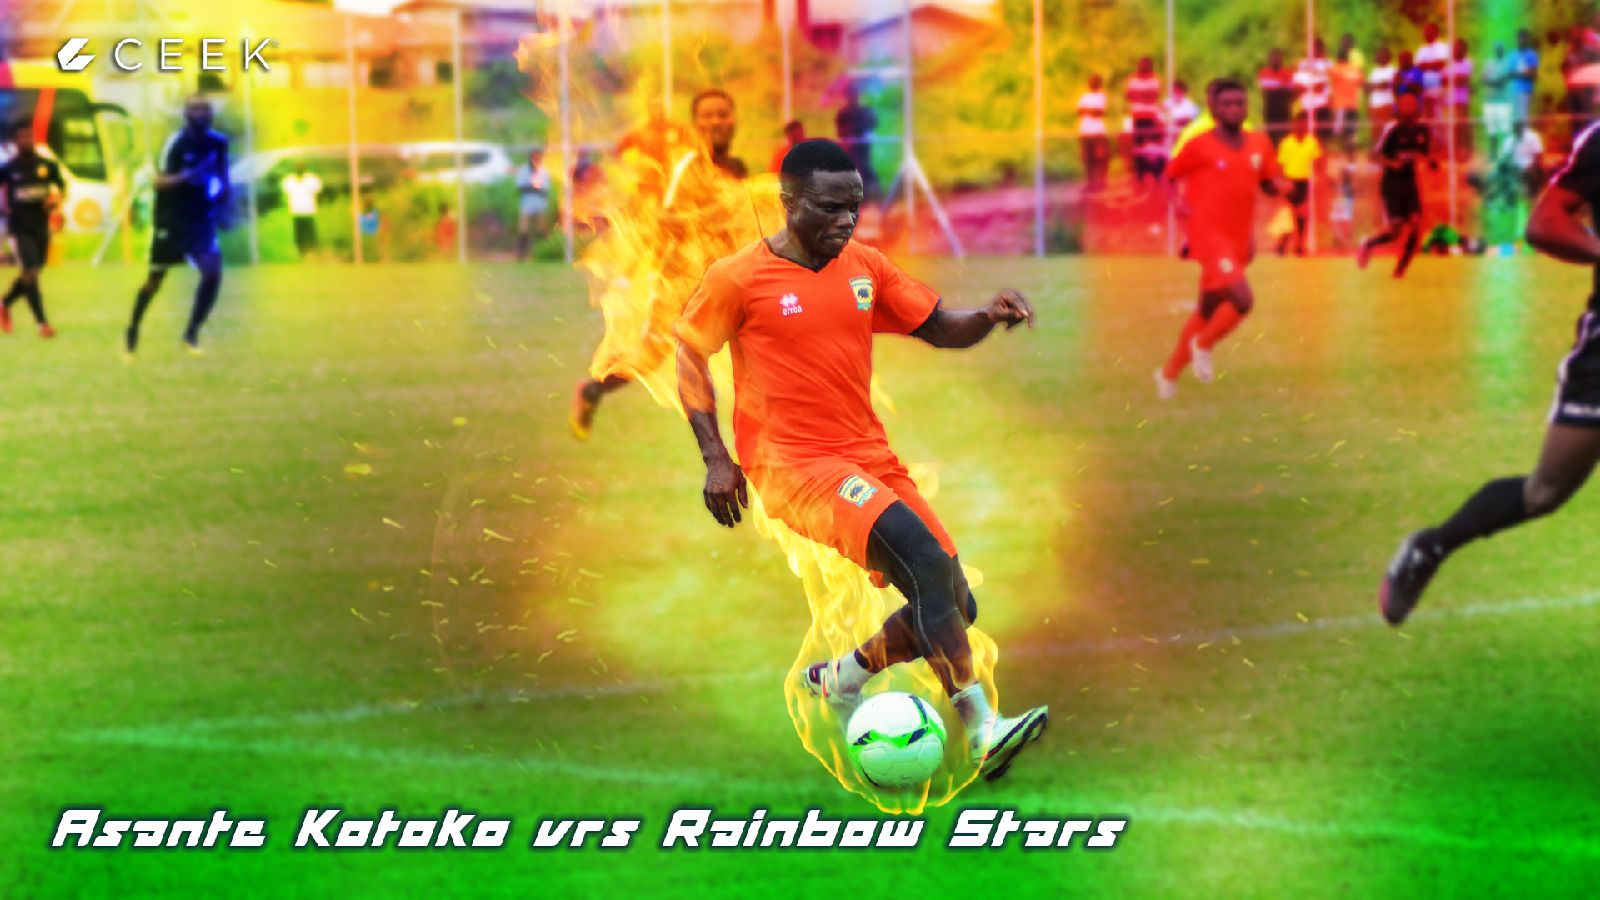 Asante Kotoko vrs Rainbow Stars